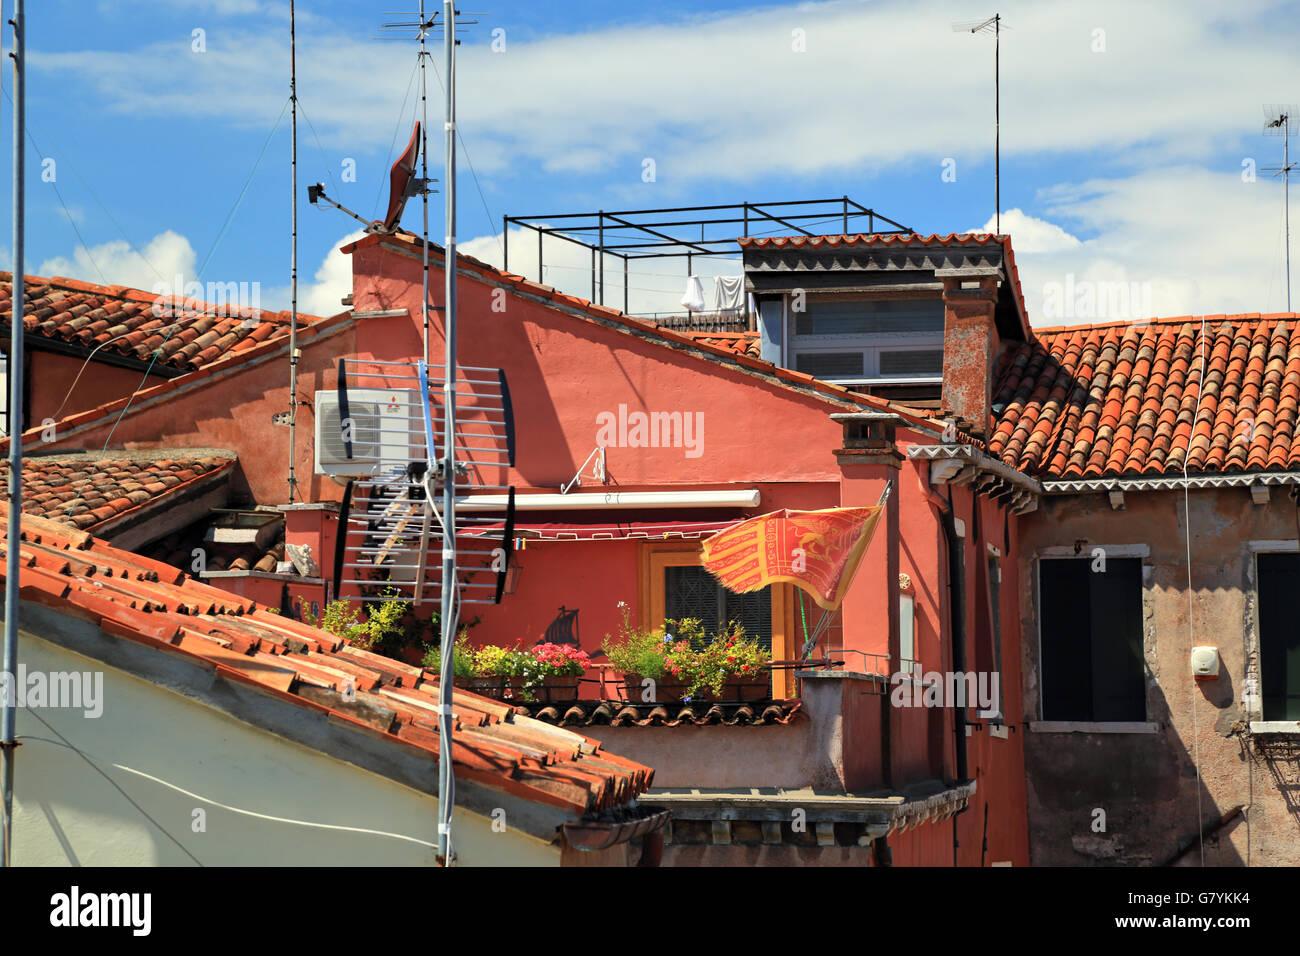 Venezianische Dachterrasse Stockbild